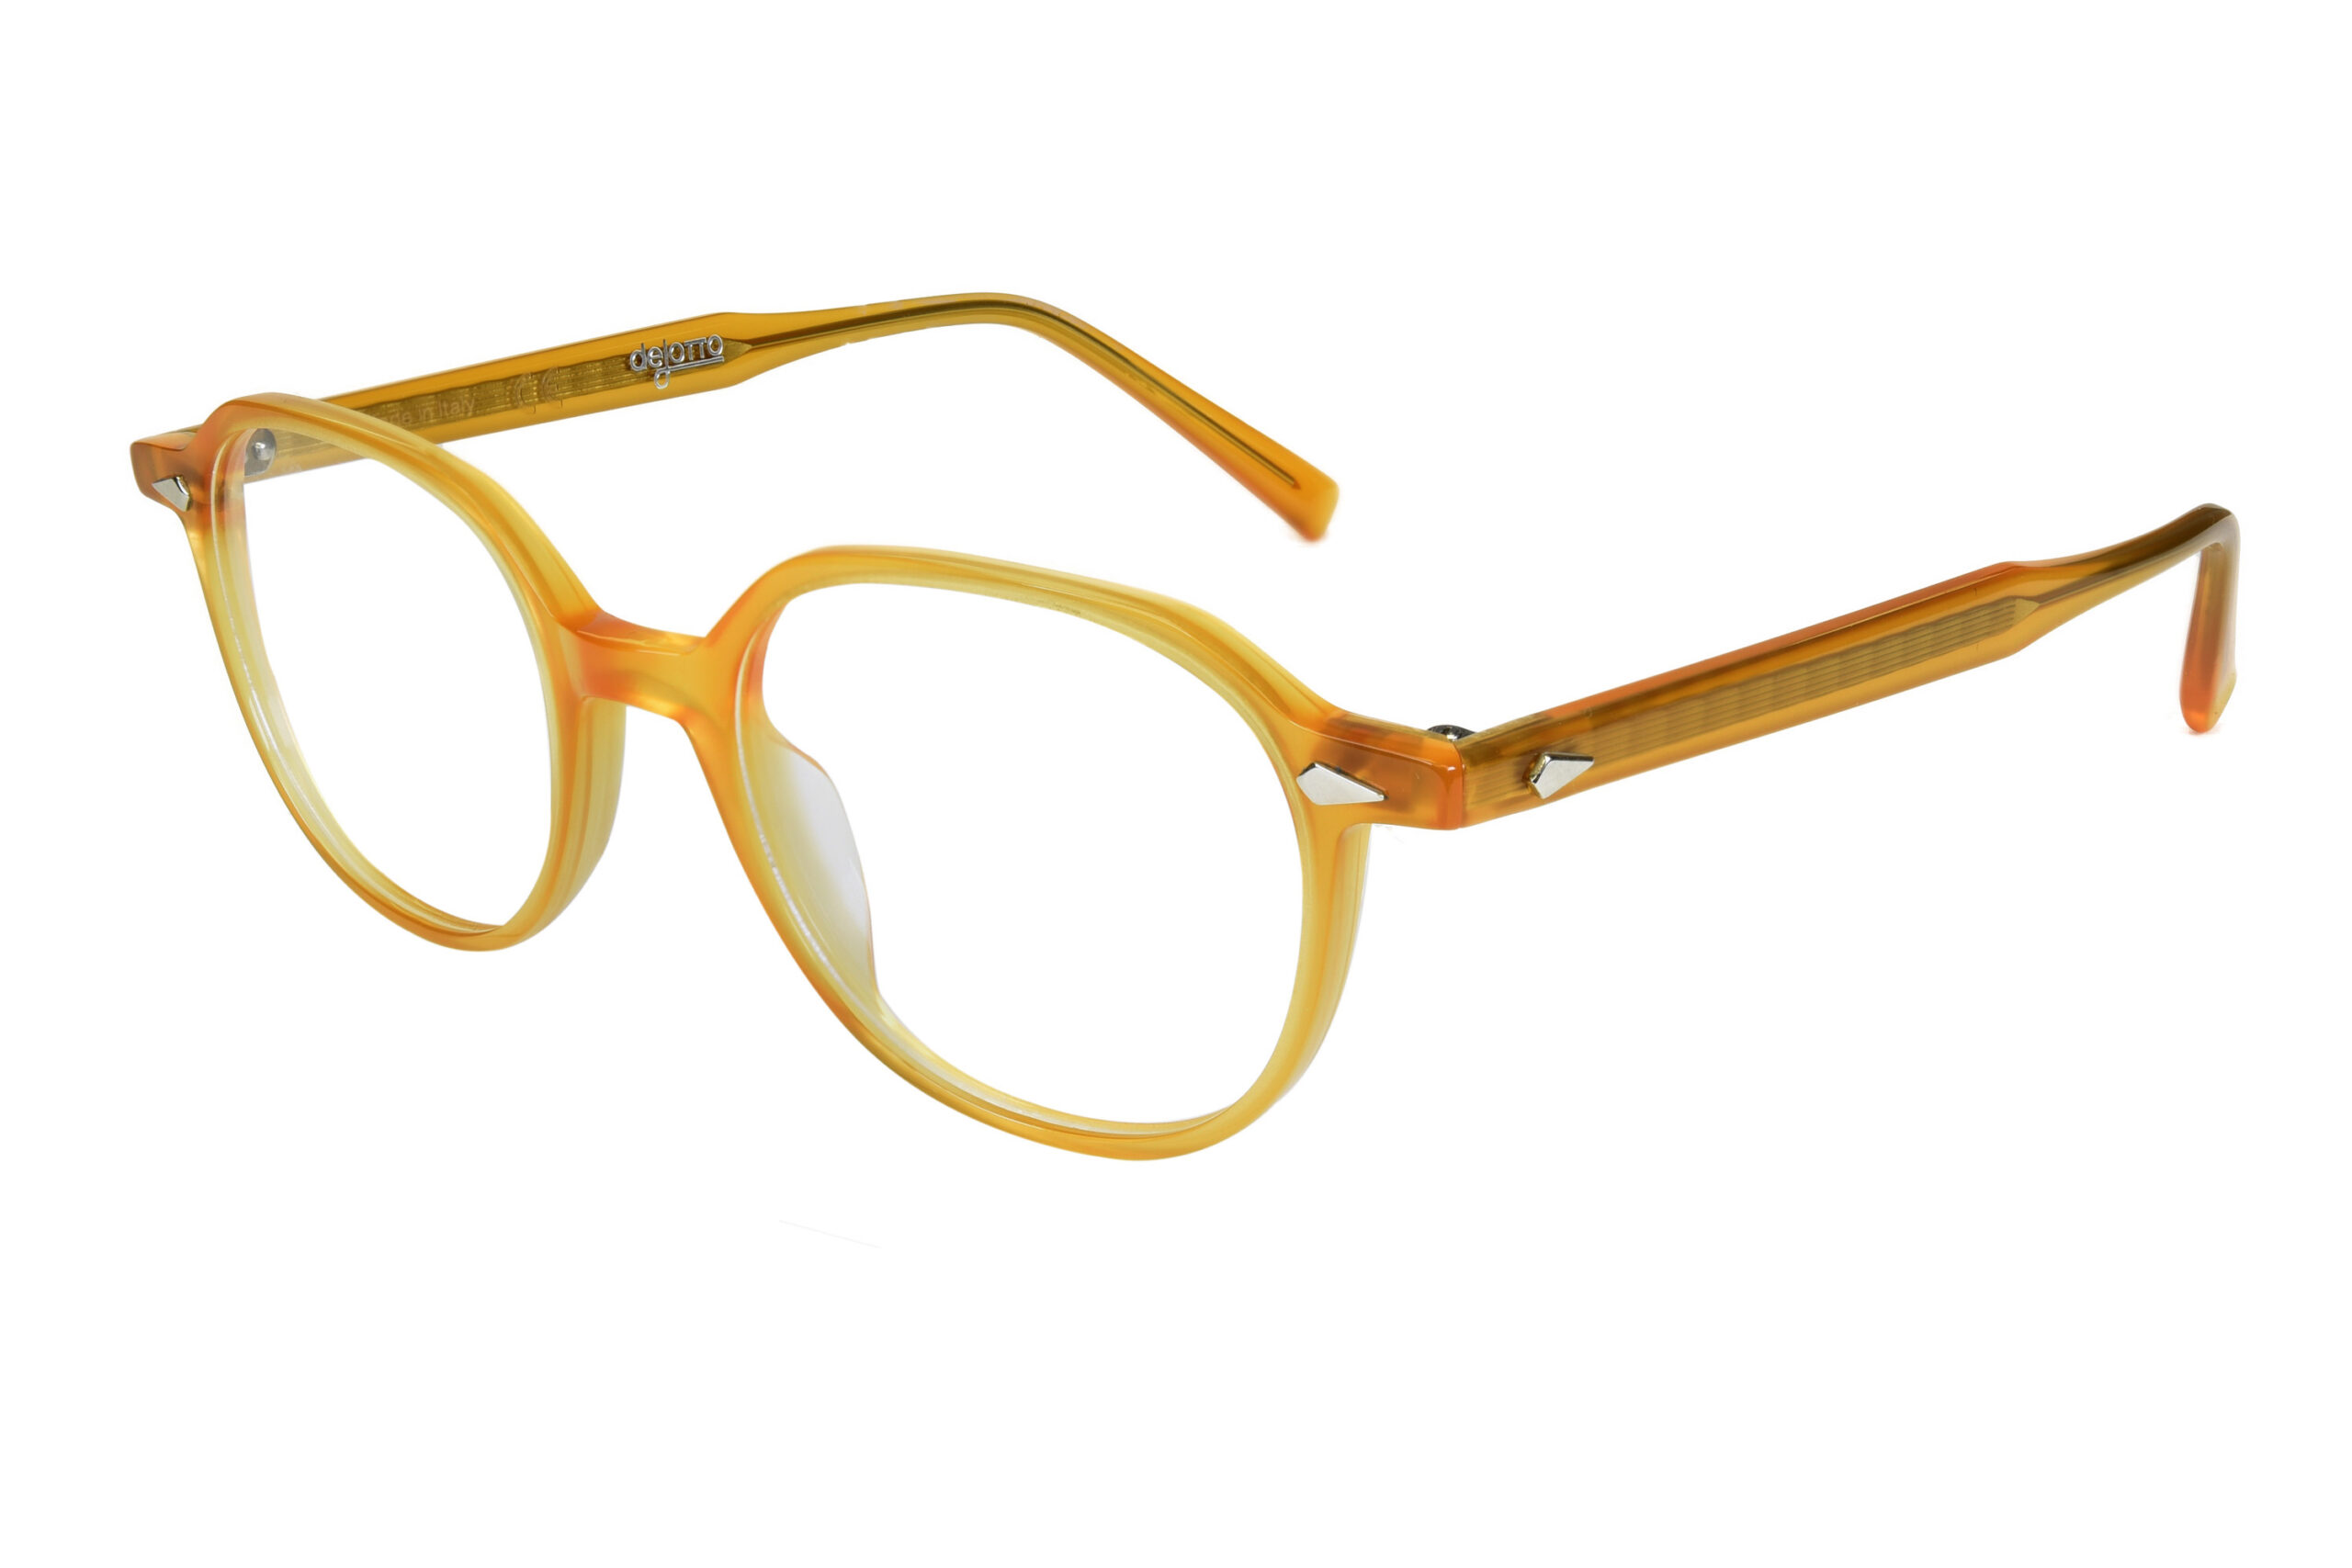 DL 144 c.8006 – Yellow